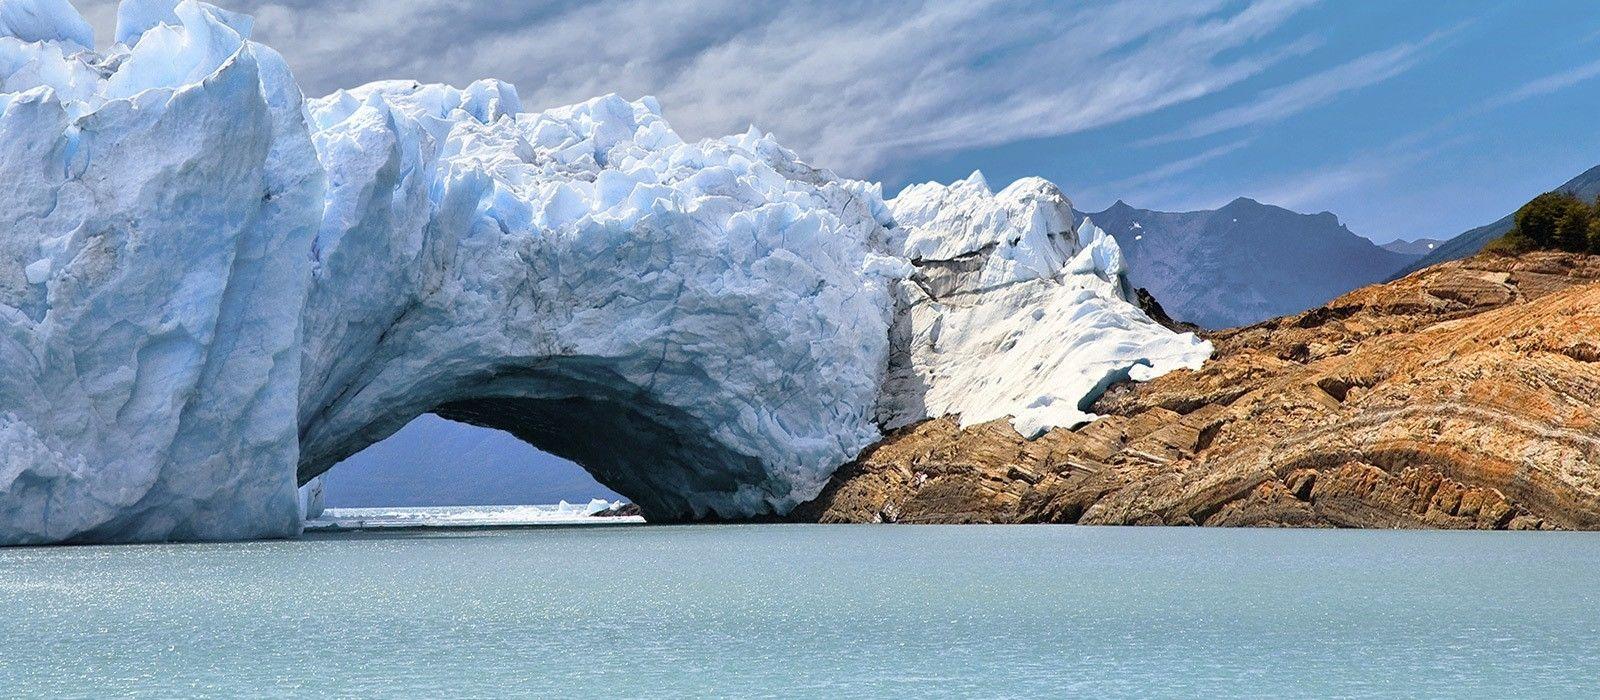 Reiseziel El Calafate Argentinien